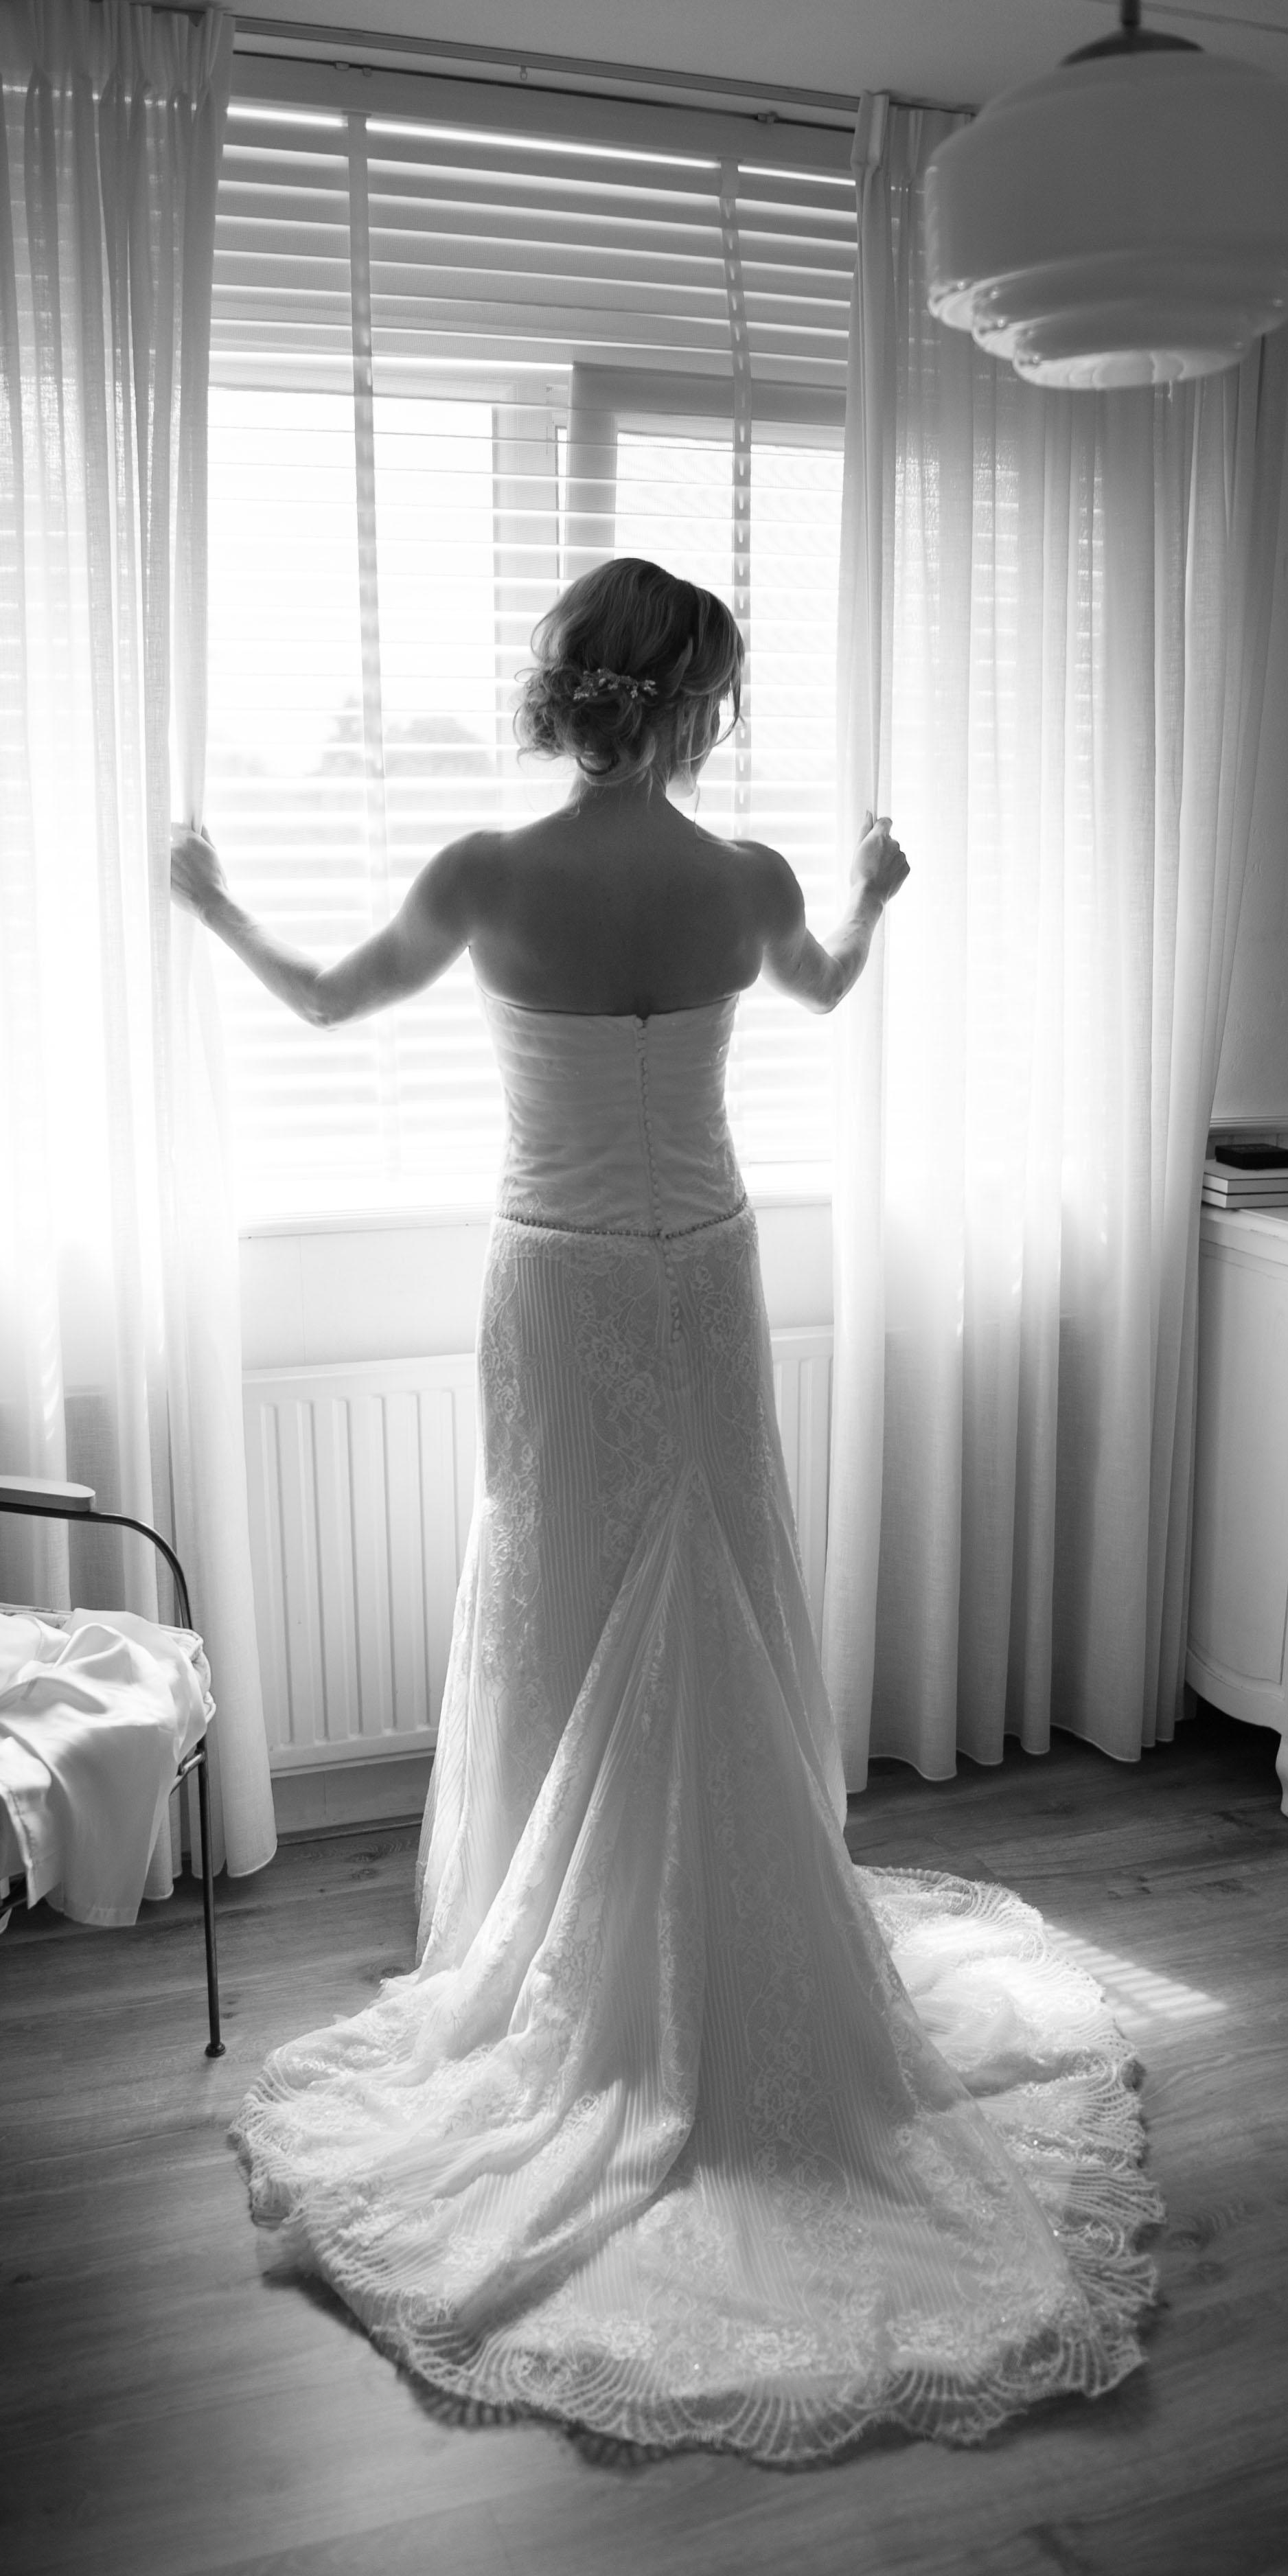 Marleen Swaans Fotografie Rosmalen - Bruidsfotografie